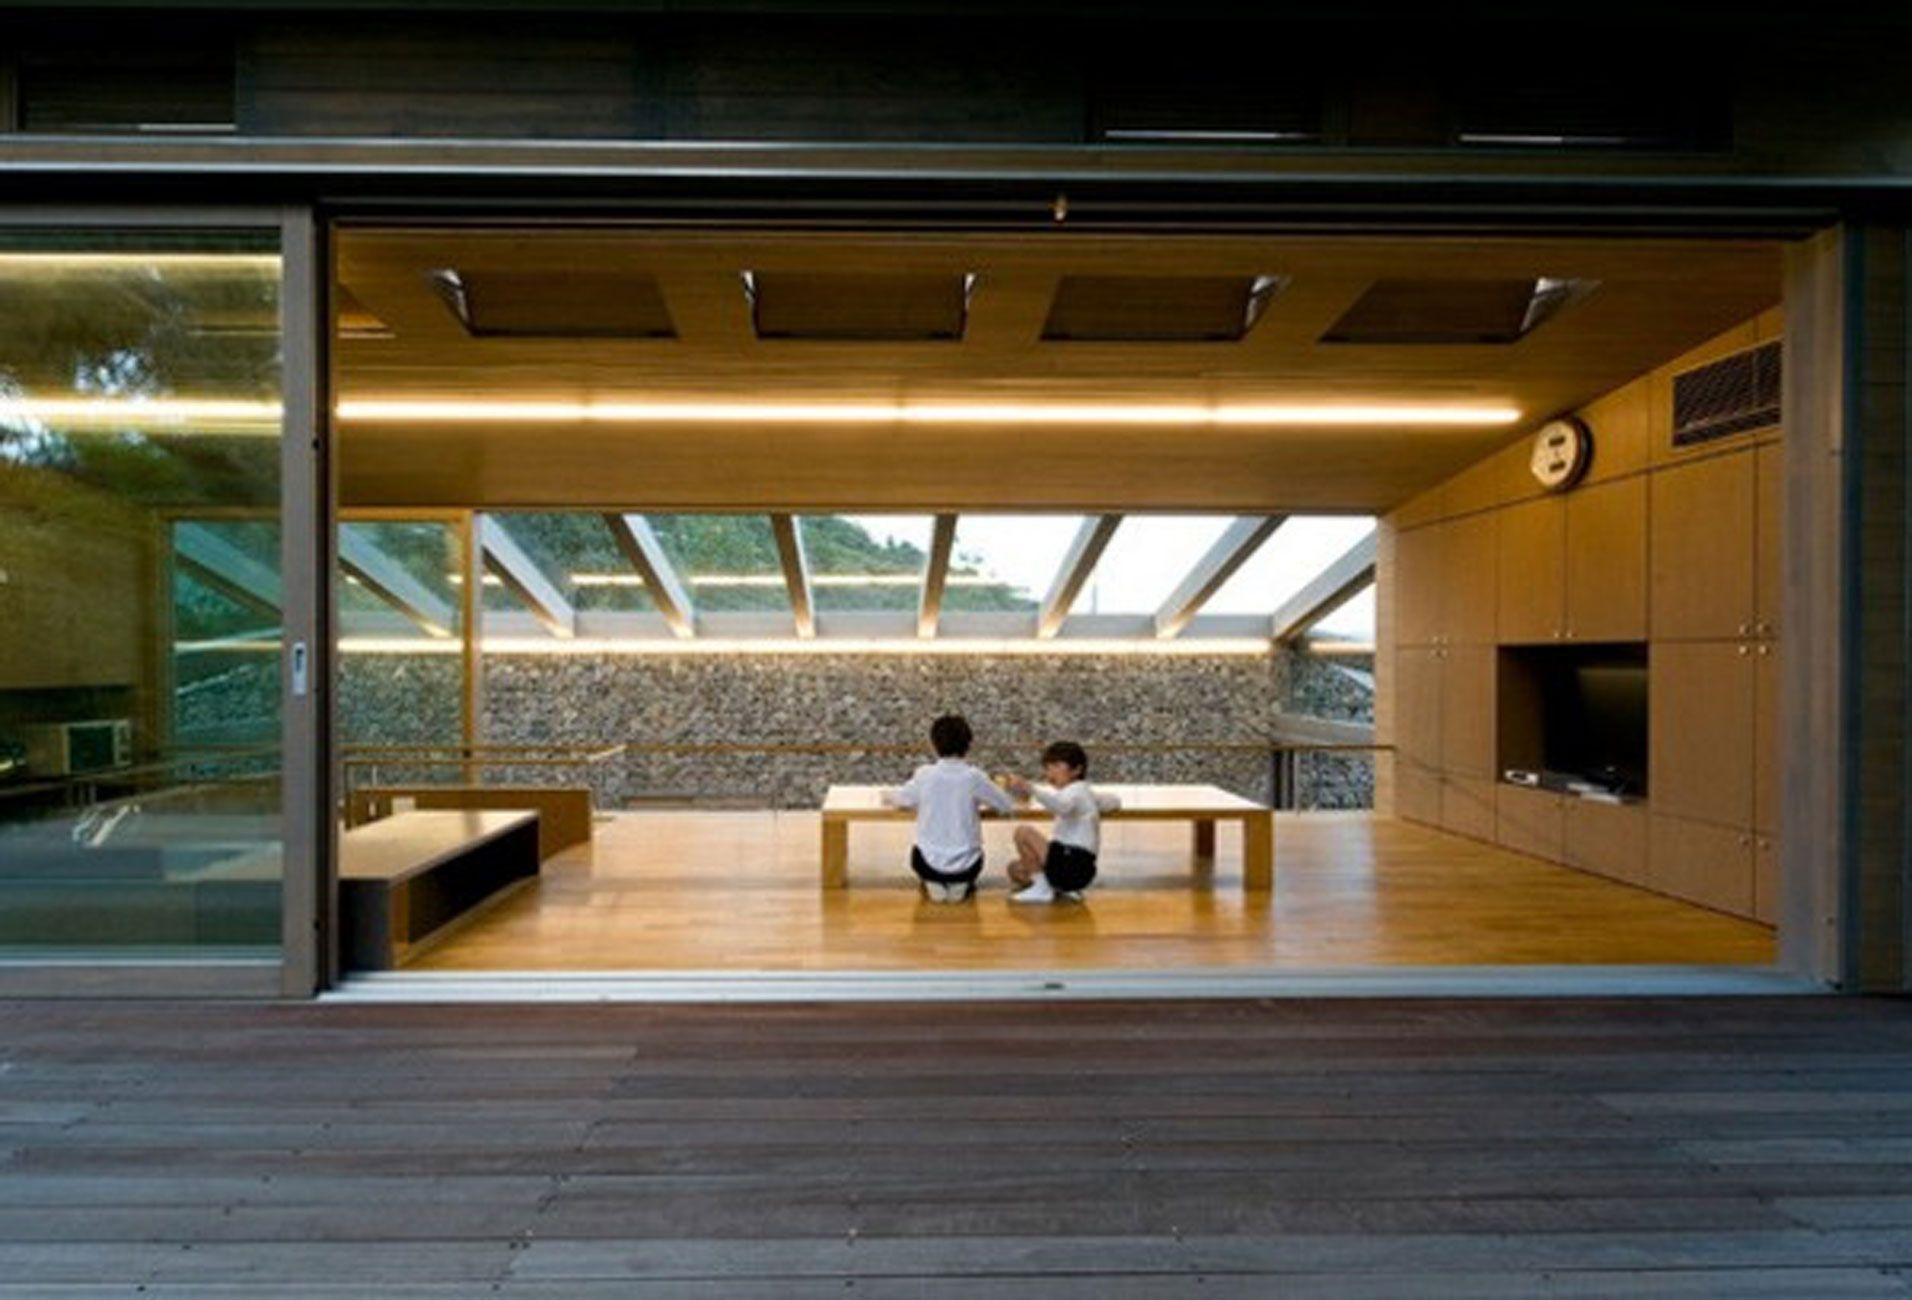 Best Interior Design Schools In Texas Minimalist modernjapanesehousedesigninteriorglassroofforminimalist